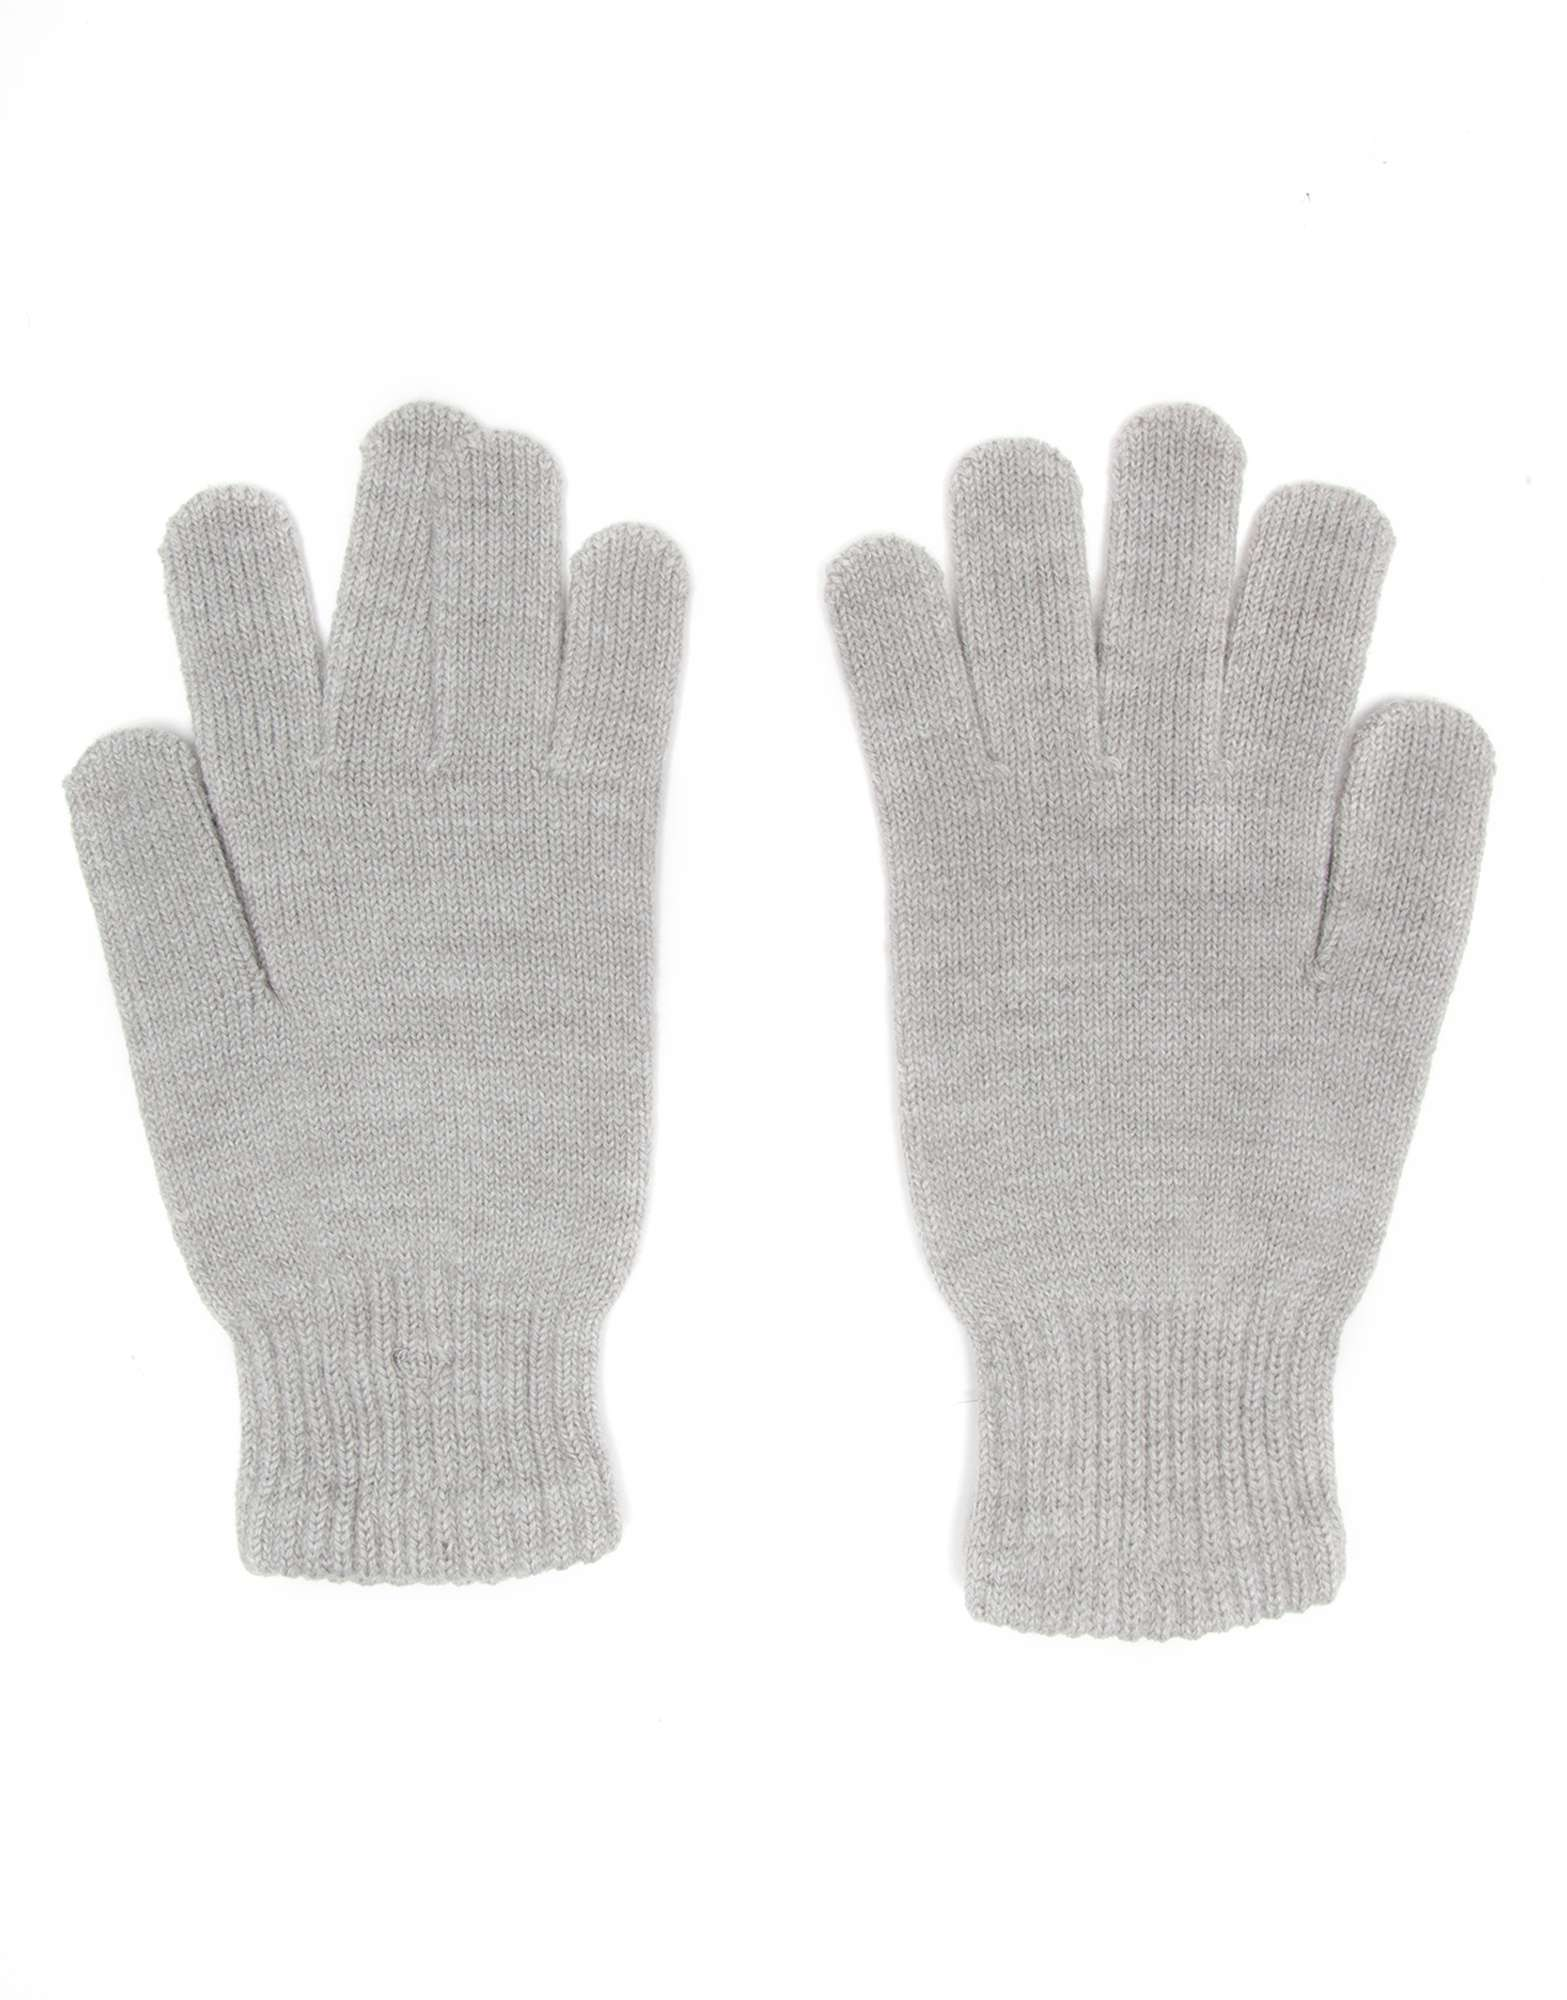 adidas Originals Ribbed Gloves